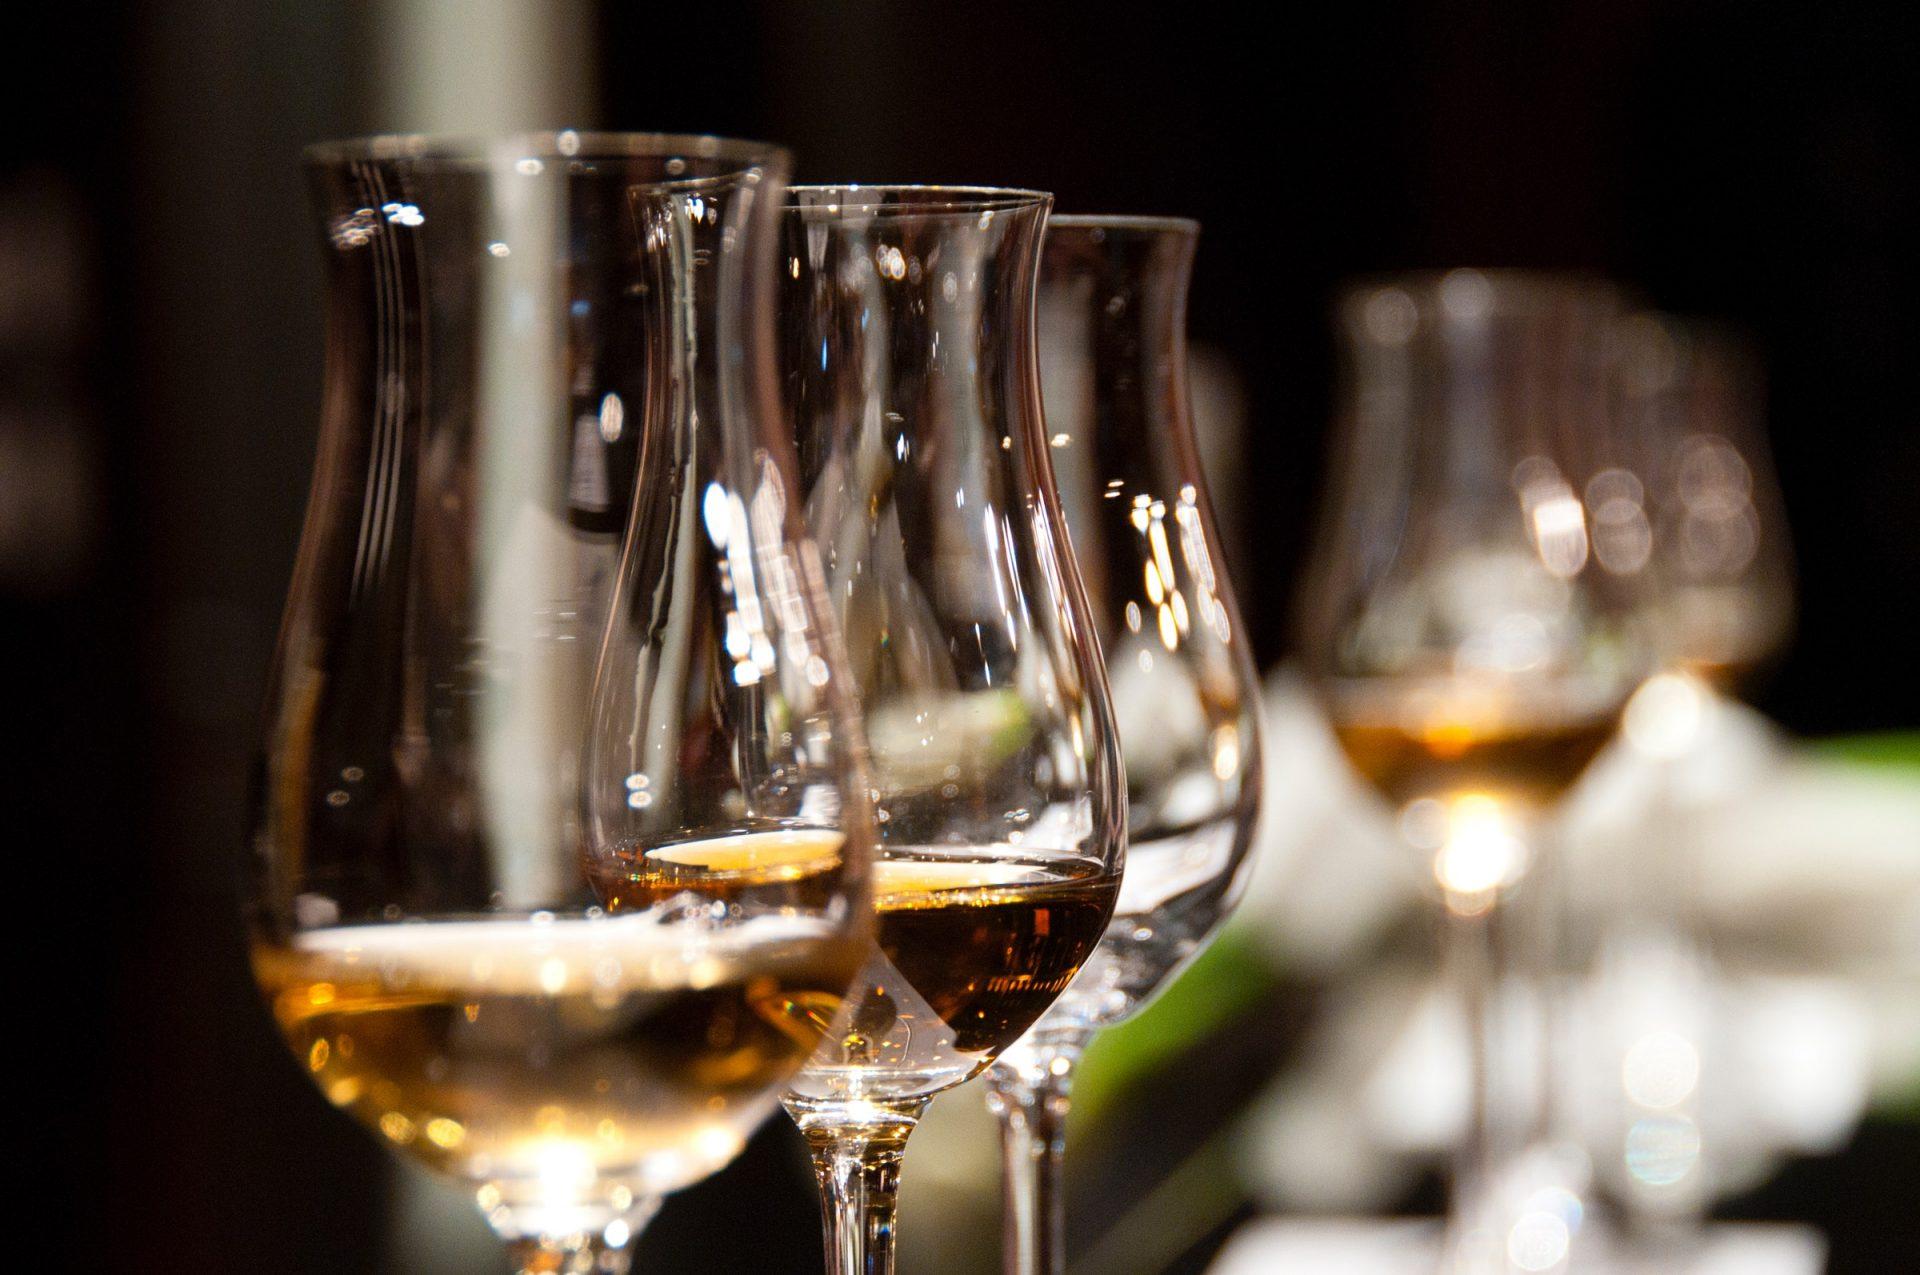 Gefüllte Whiskygläser